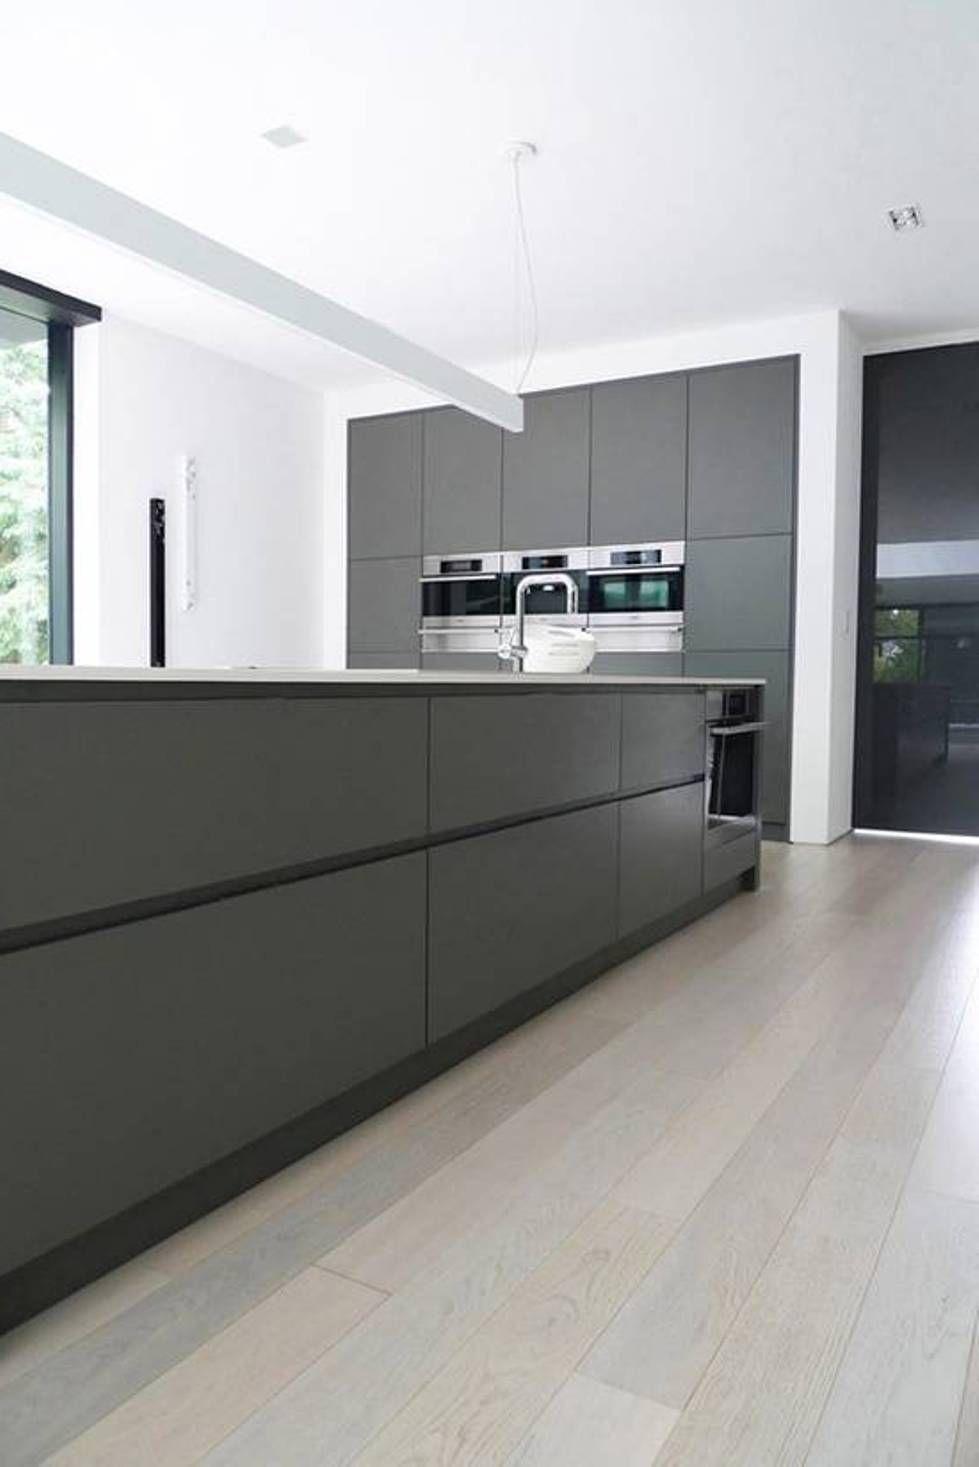 Grey Kitchen Ideas Stainless Steel Appliances No Handle Bars On Cabinetes White Modern Kitchen Gray And White Kitchen Modern Kitchen Design